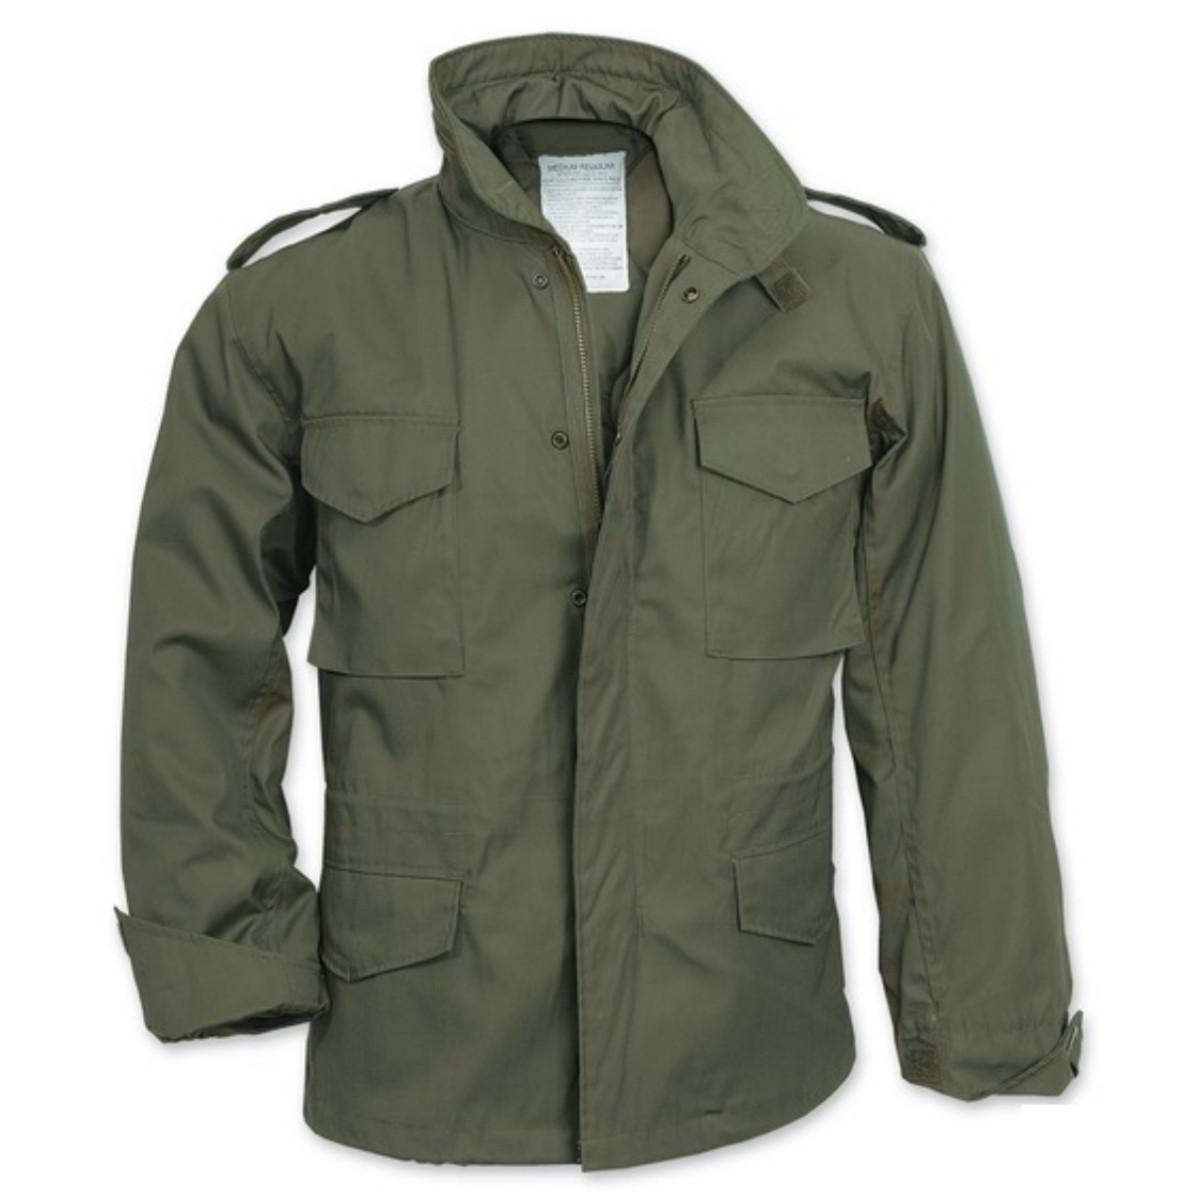 Демисезонная мужская куртка Surplus Us Fieldjacket M65 OLIV